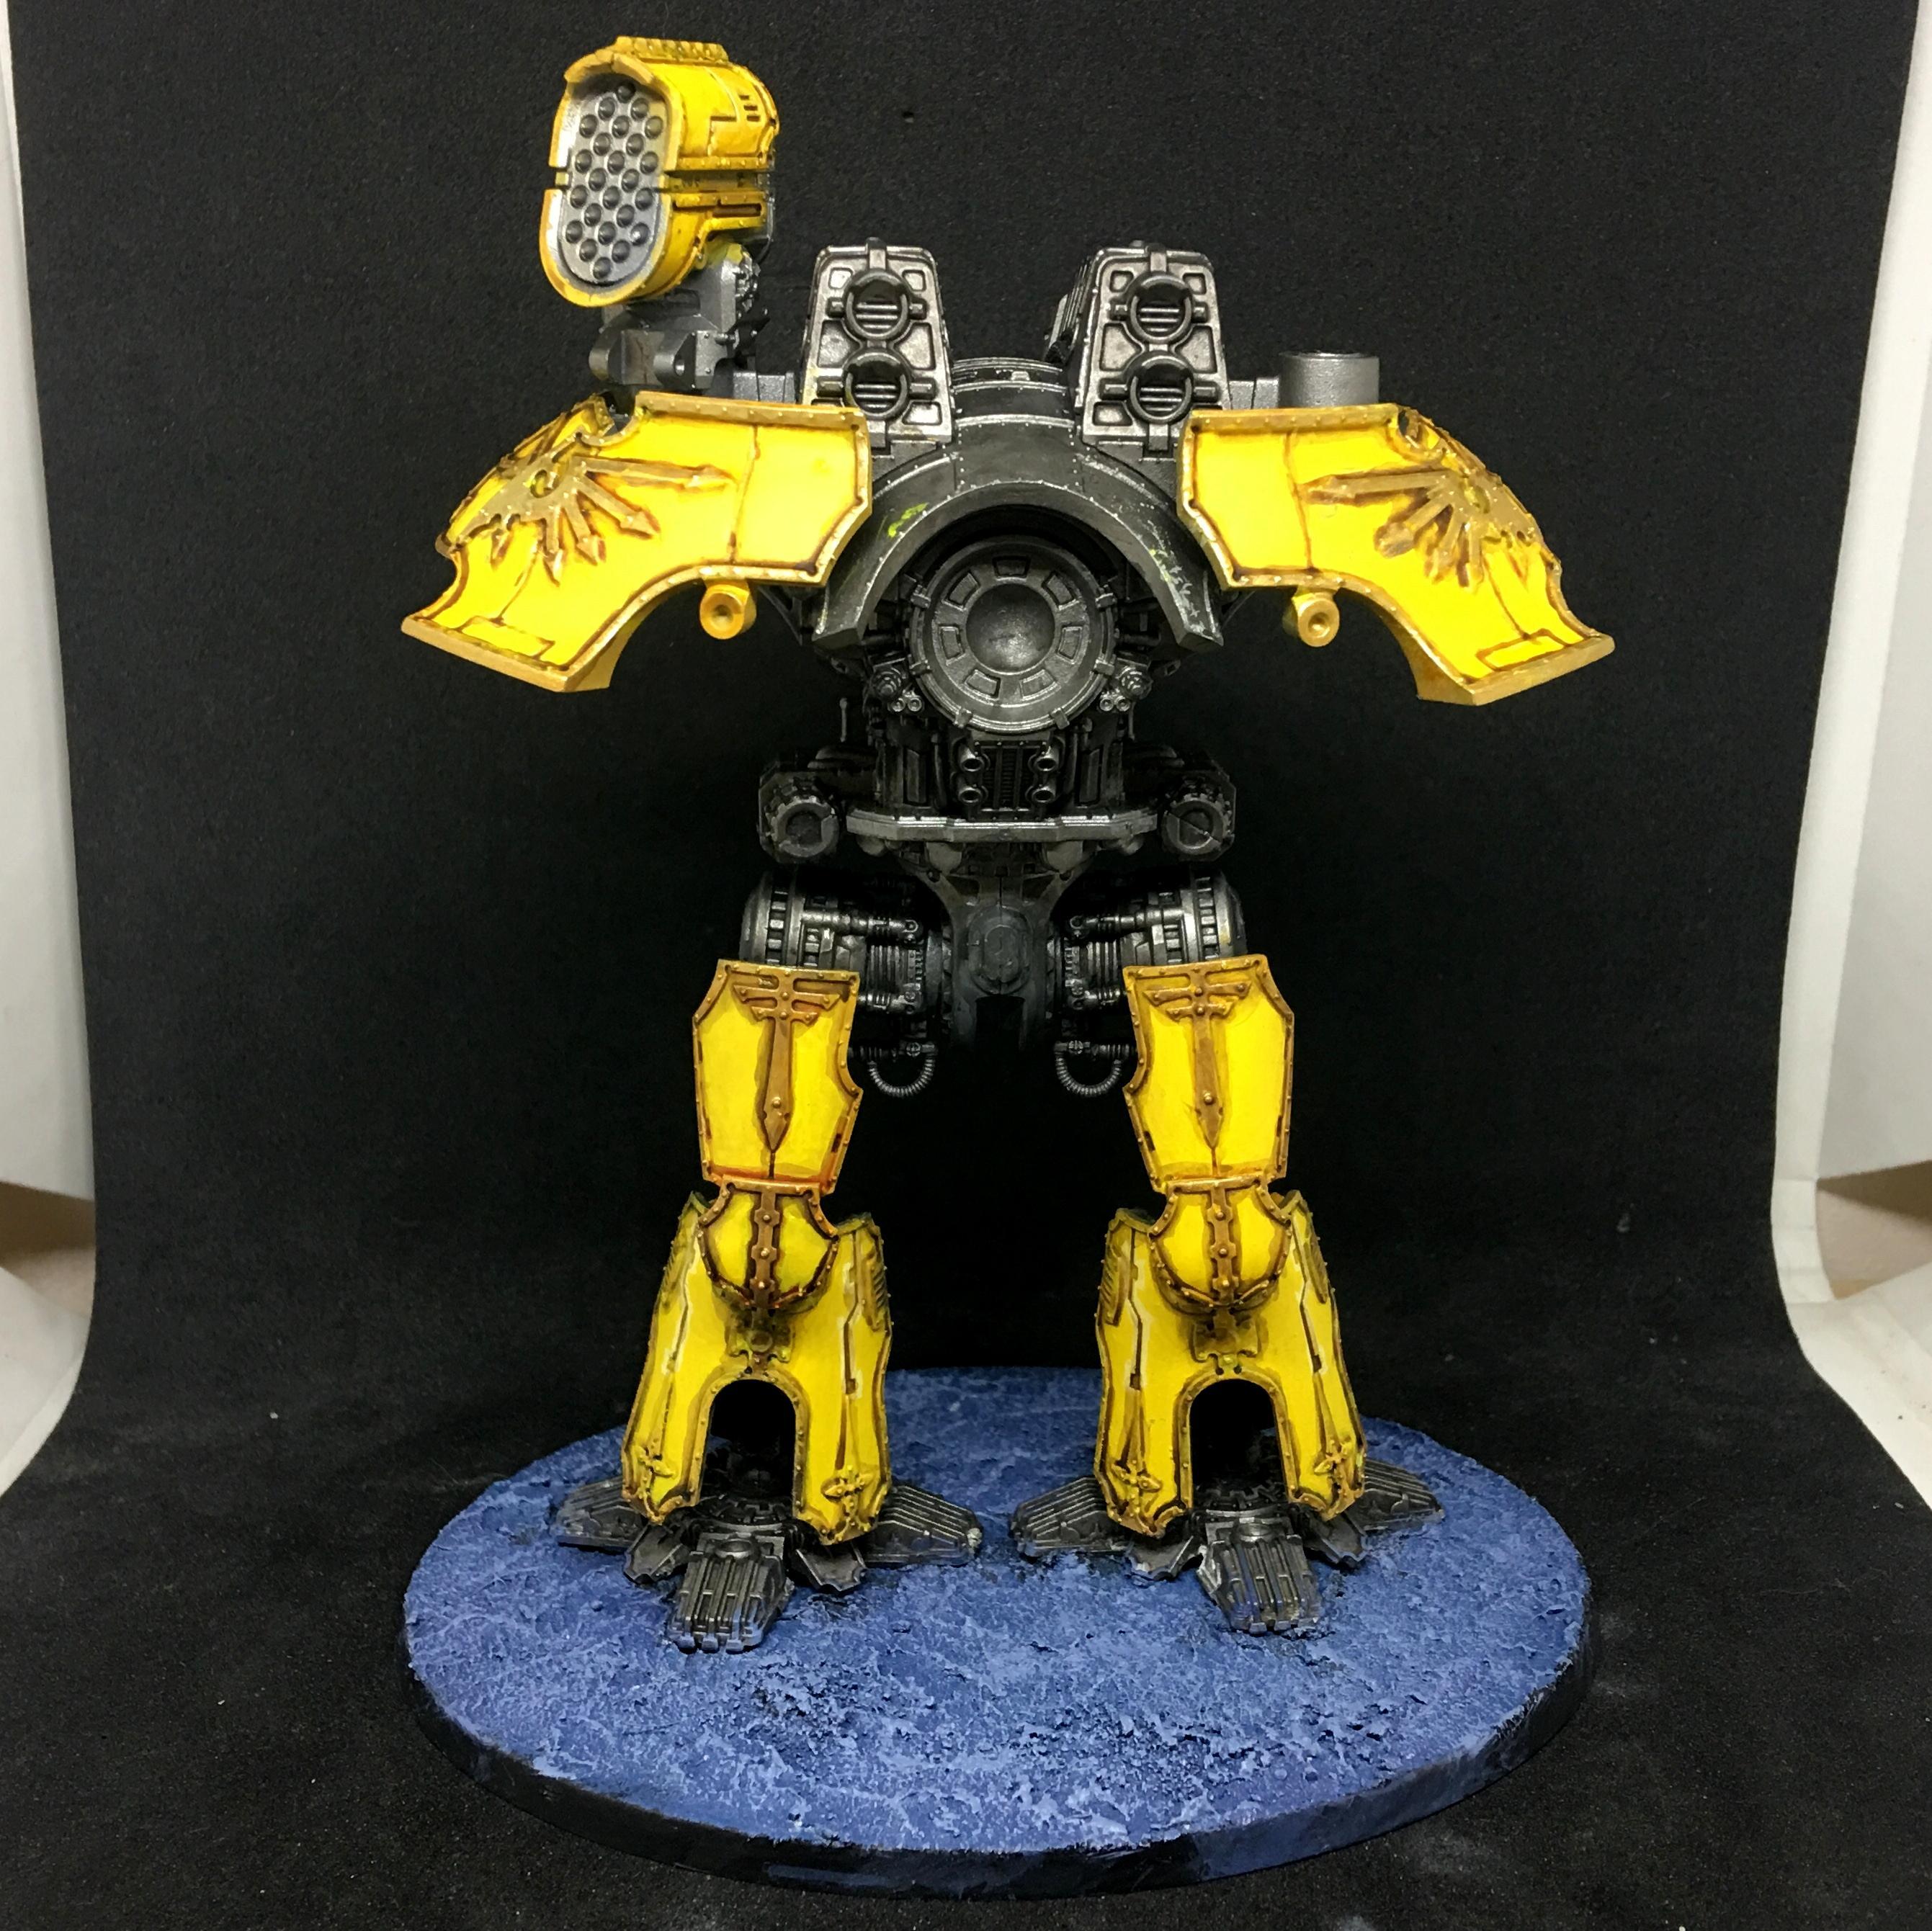 Adeptus Titanicus, Legio Fureans, Tiger Eyes, Titan, Titanicus, Warhammer 40,000, Warlord